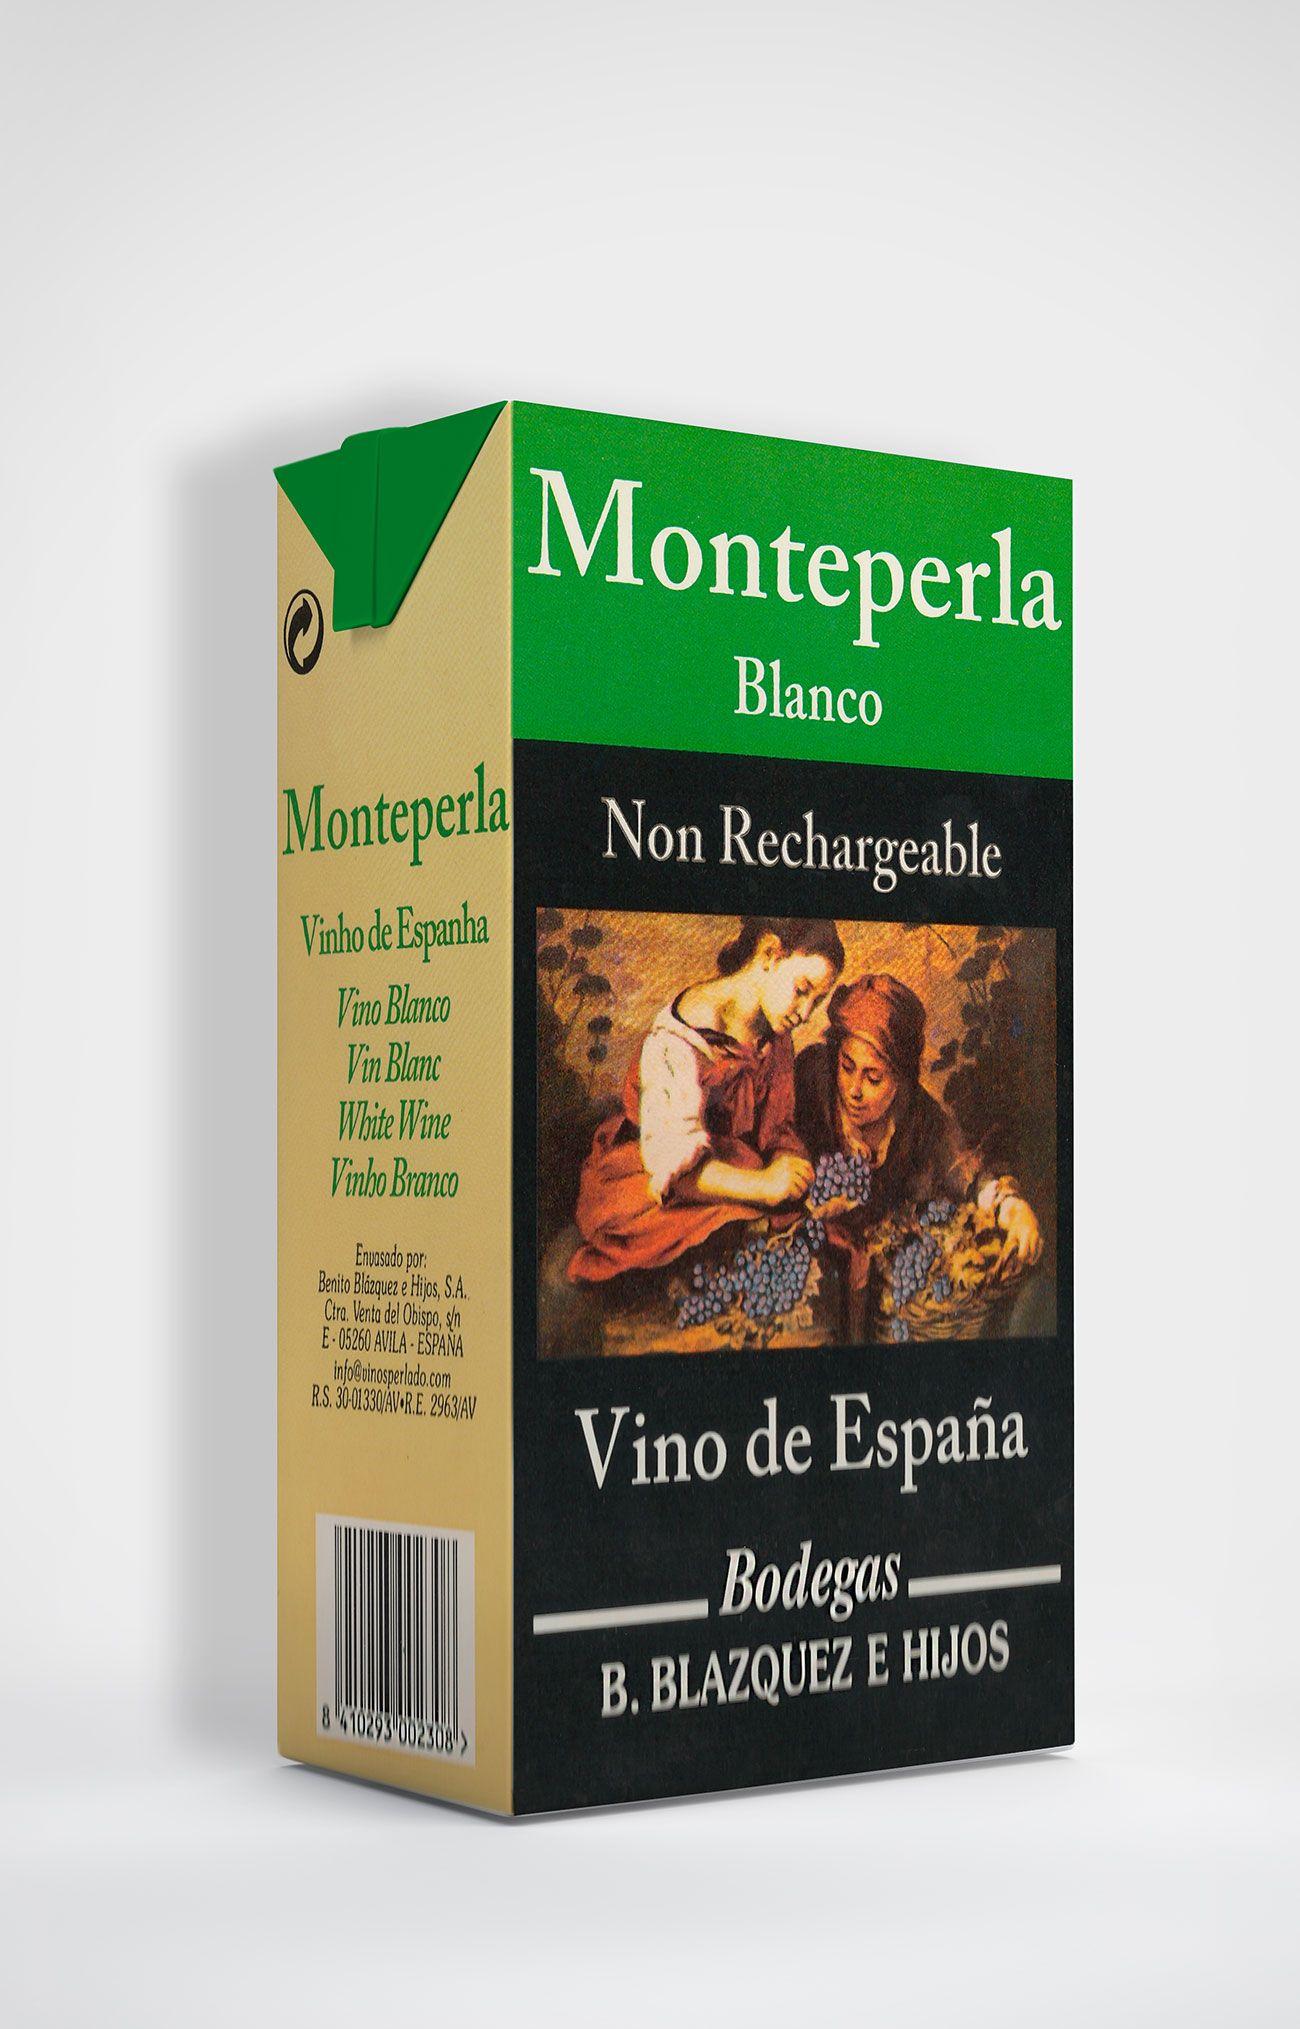 Benito Blázquez - Brik de Vino Monteperla Blanco